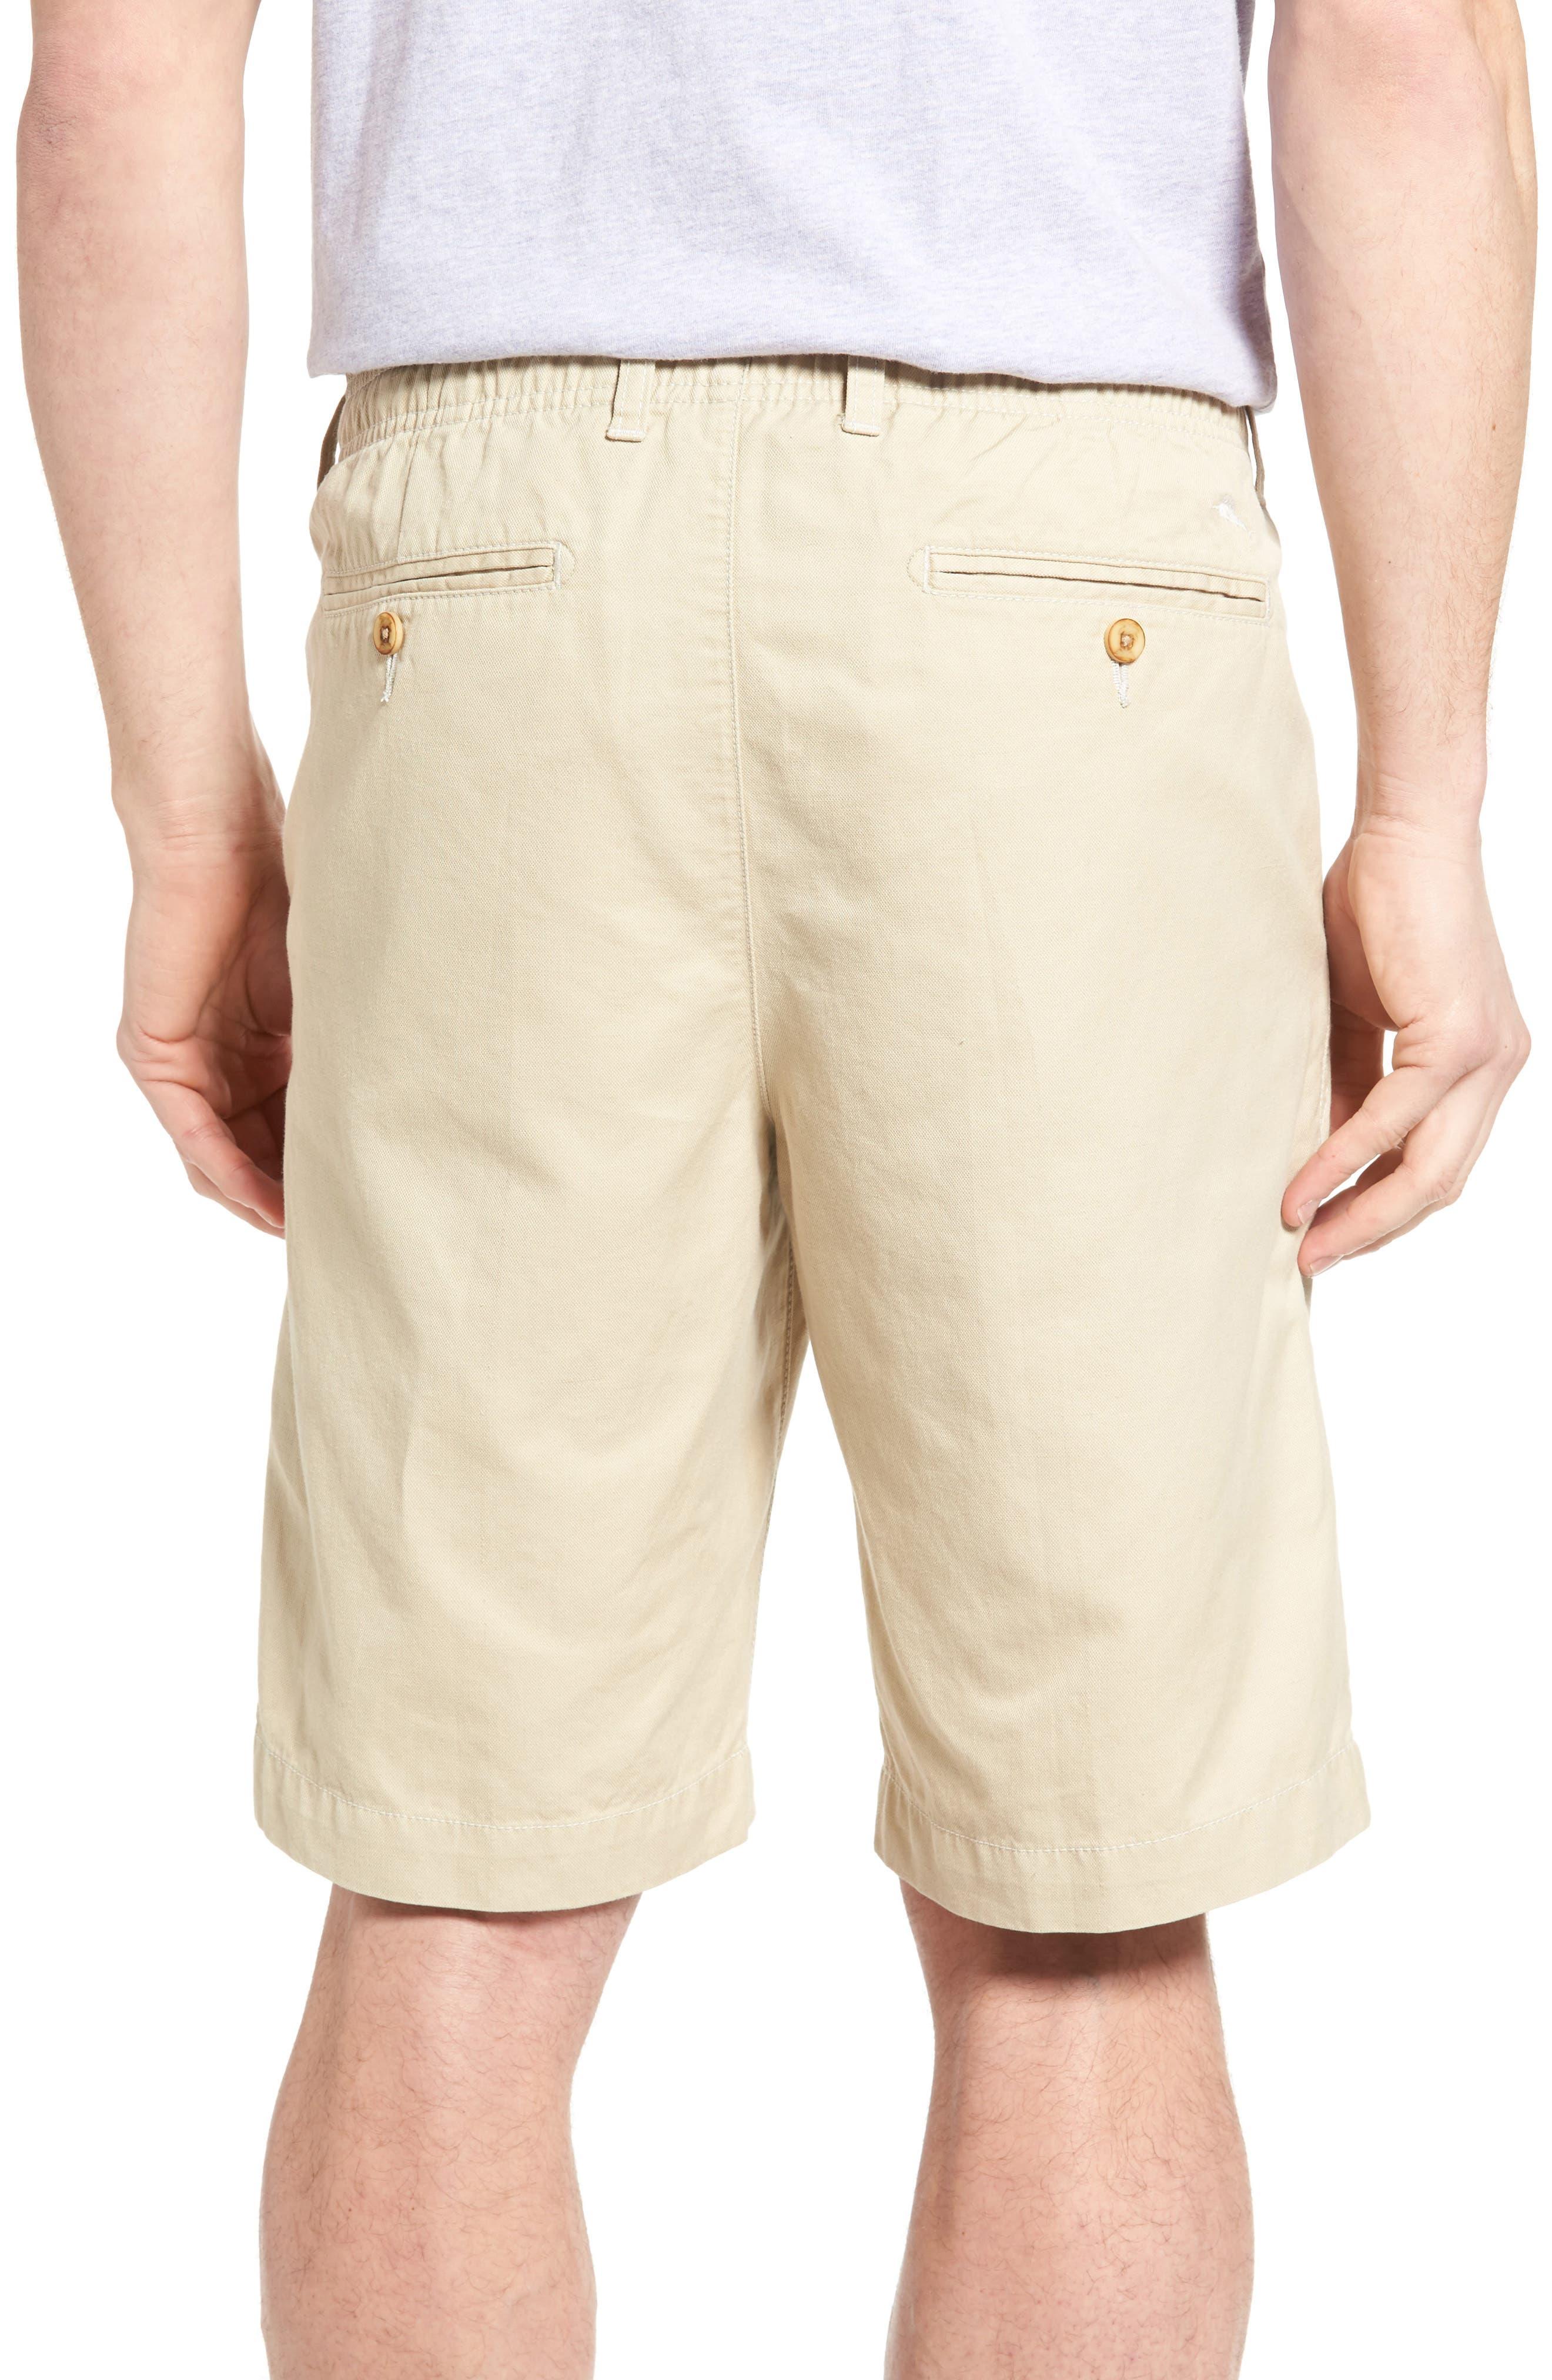 Aegean Lounger Shorts,                             Alternate thumbnail 2, color,                             200